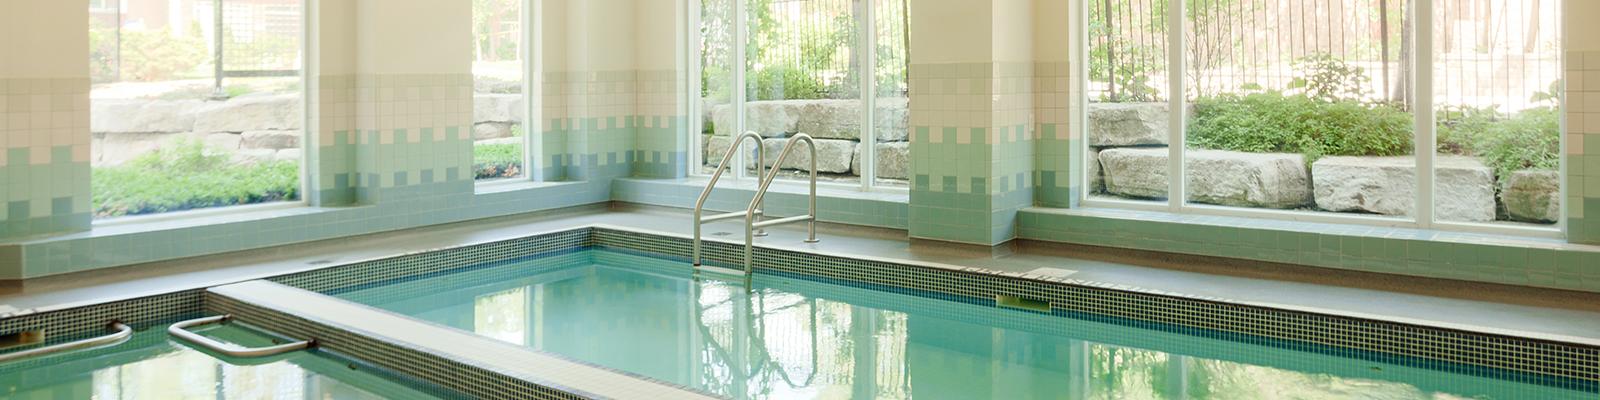 Saltwater pool at Amica Bayview Gardens senior retirement residence.